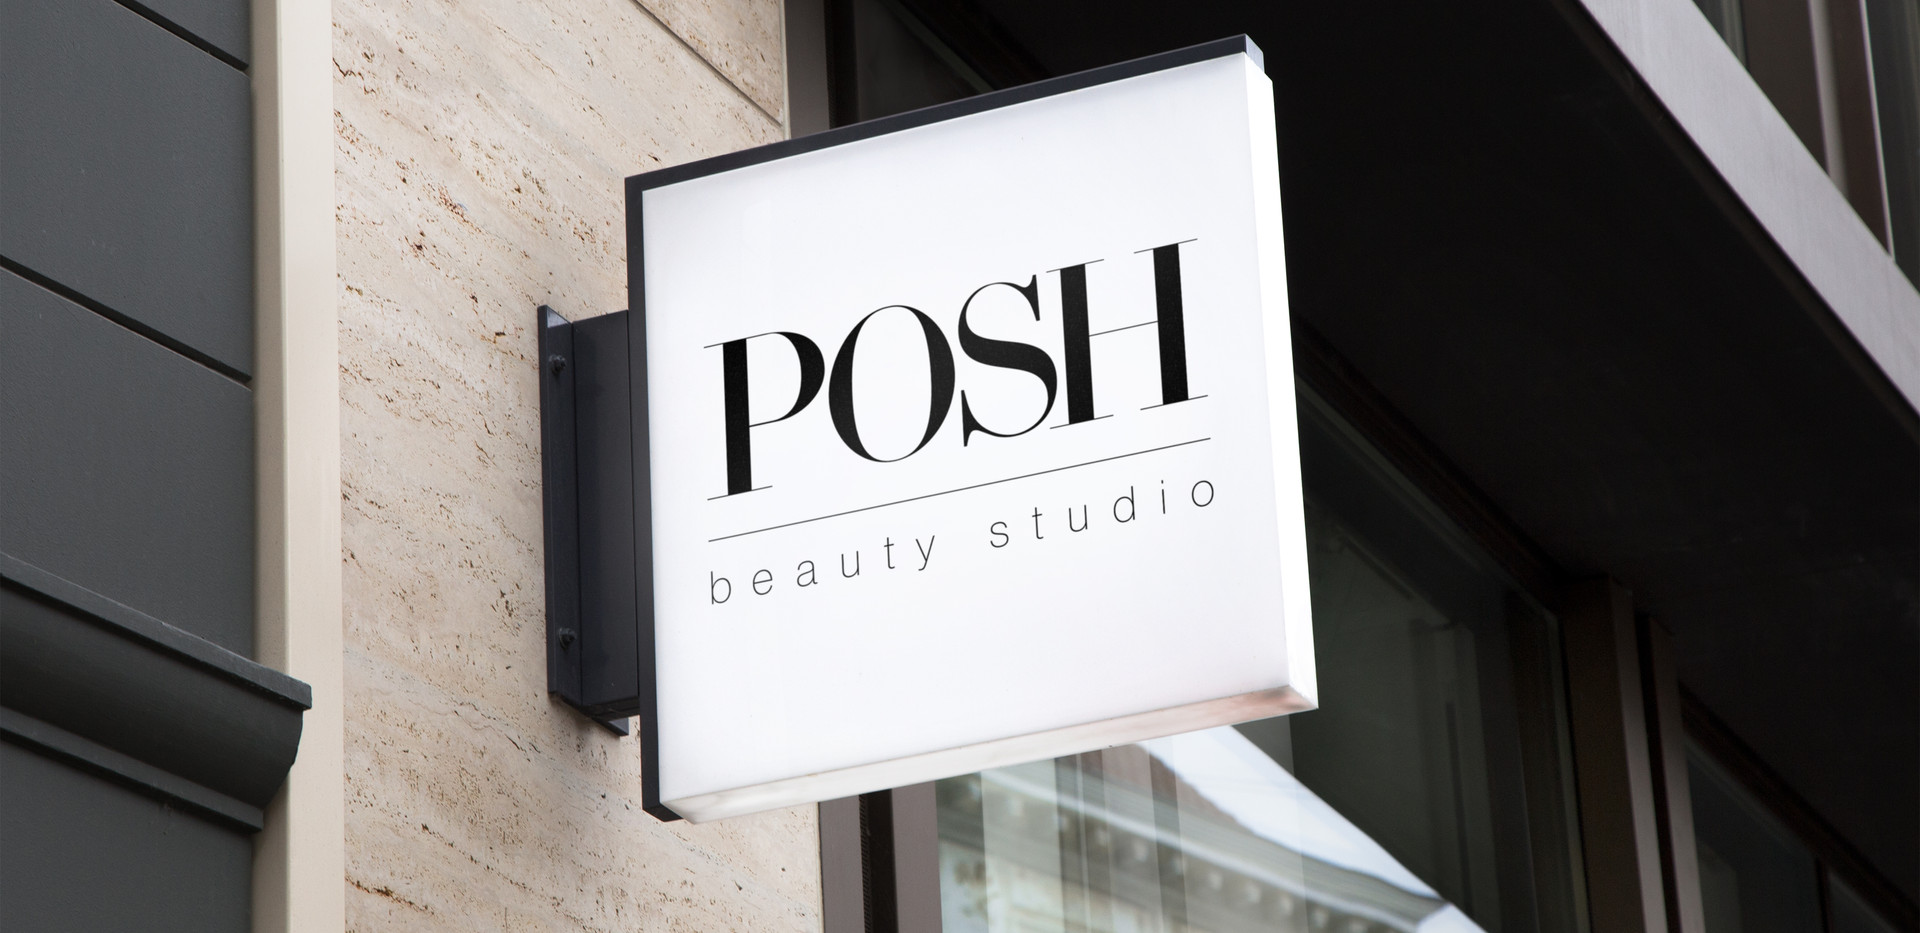 POSH Beauty Studio Logo